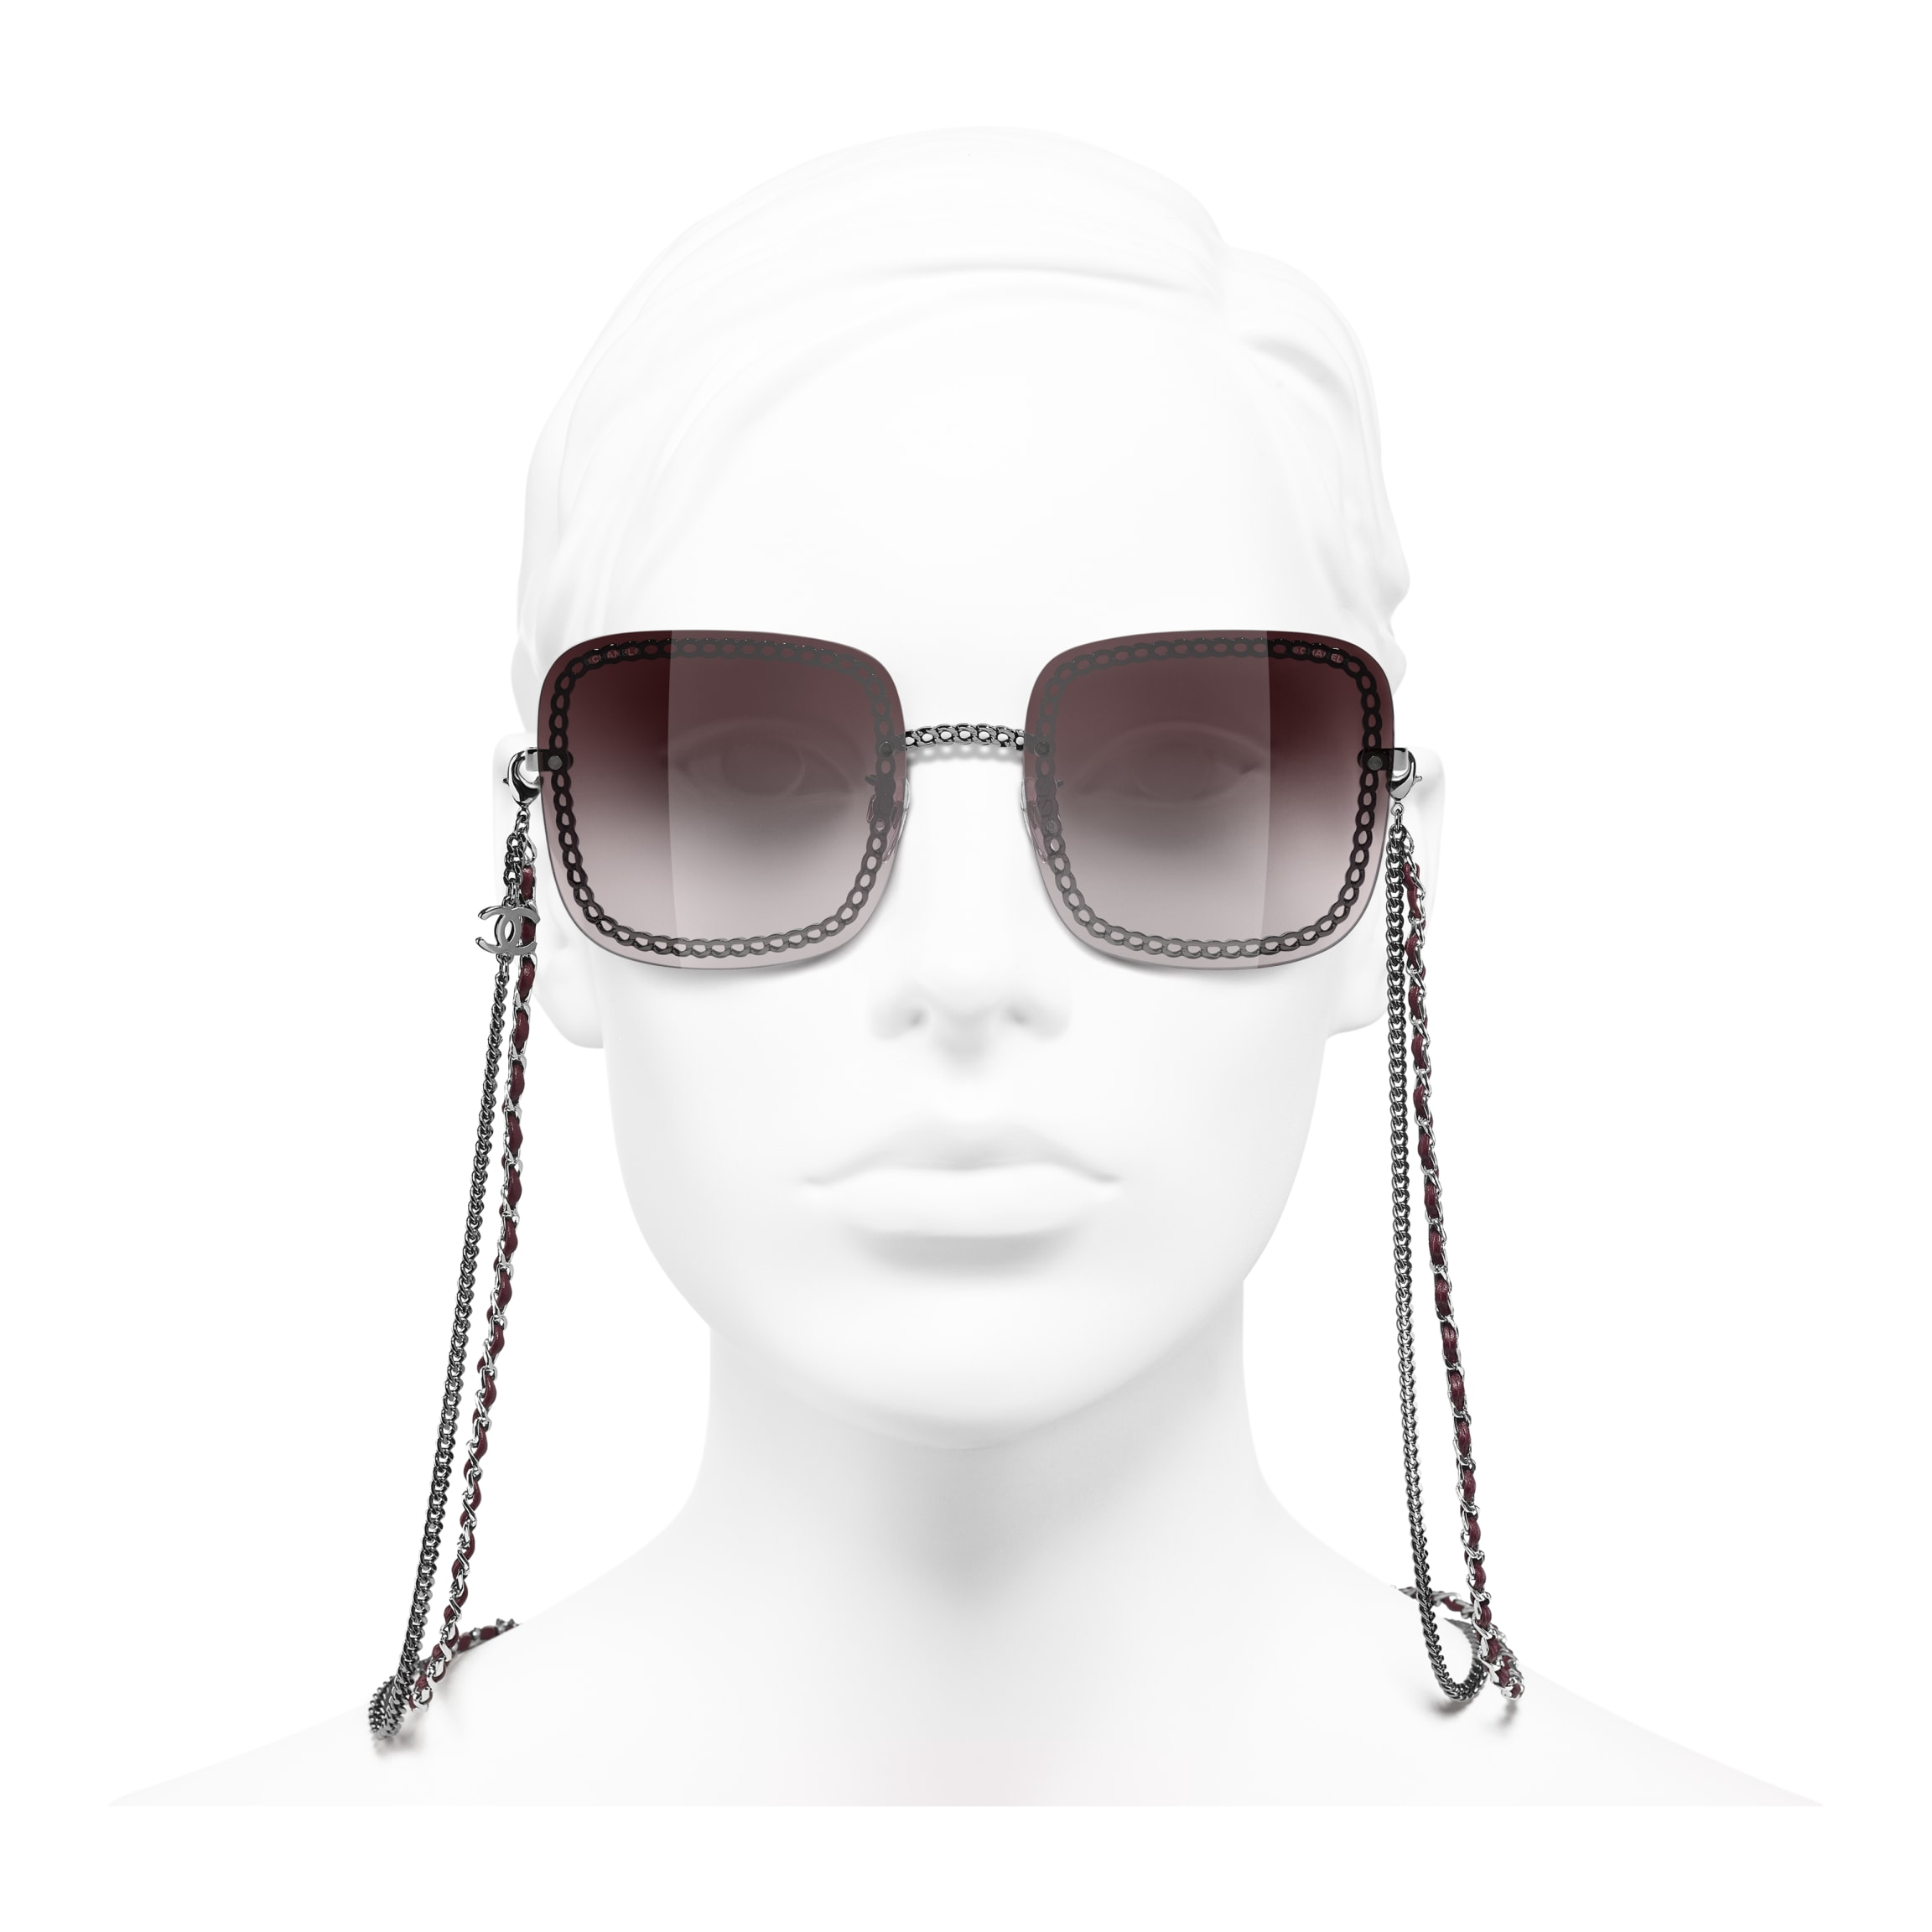 Sunglasses Charms Antique Silver Finish 10x21mm Set of 20 pcs A7951